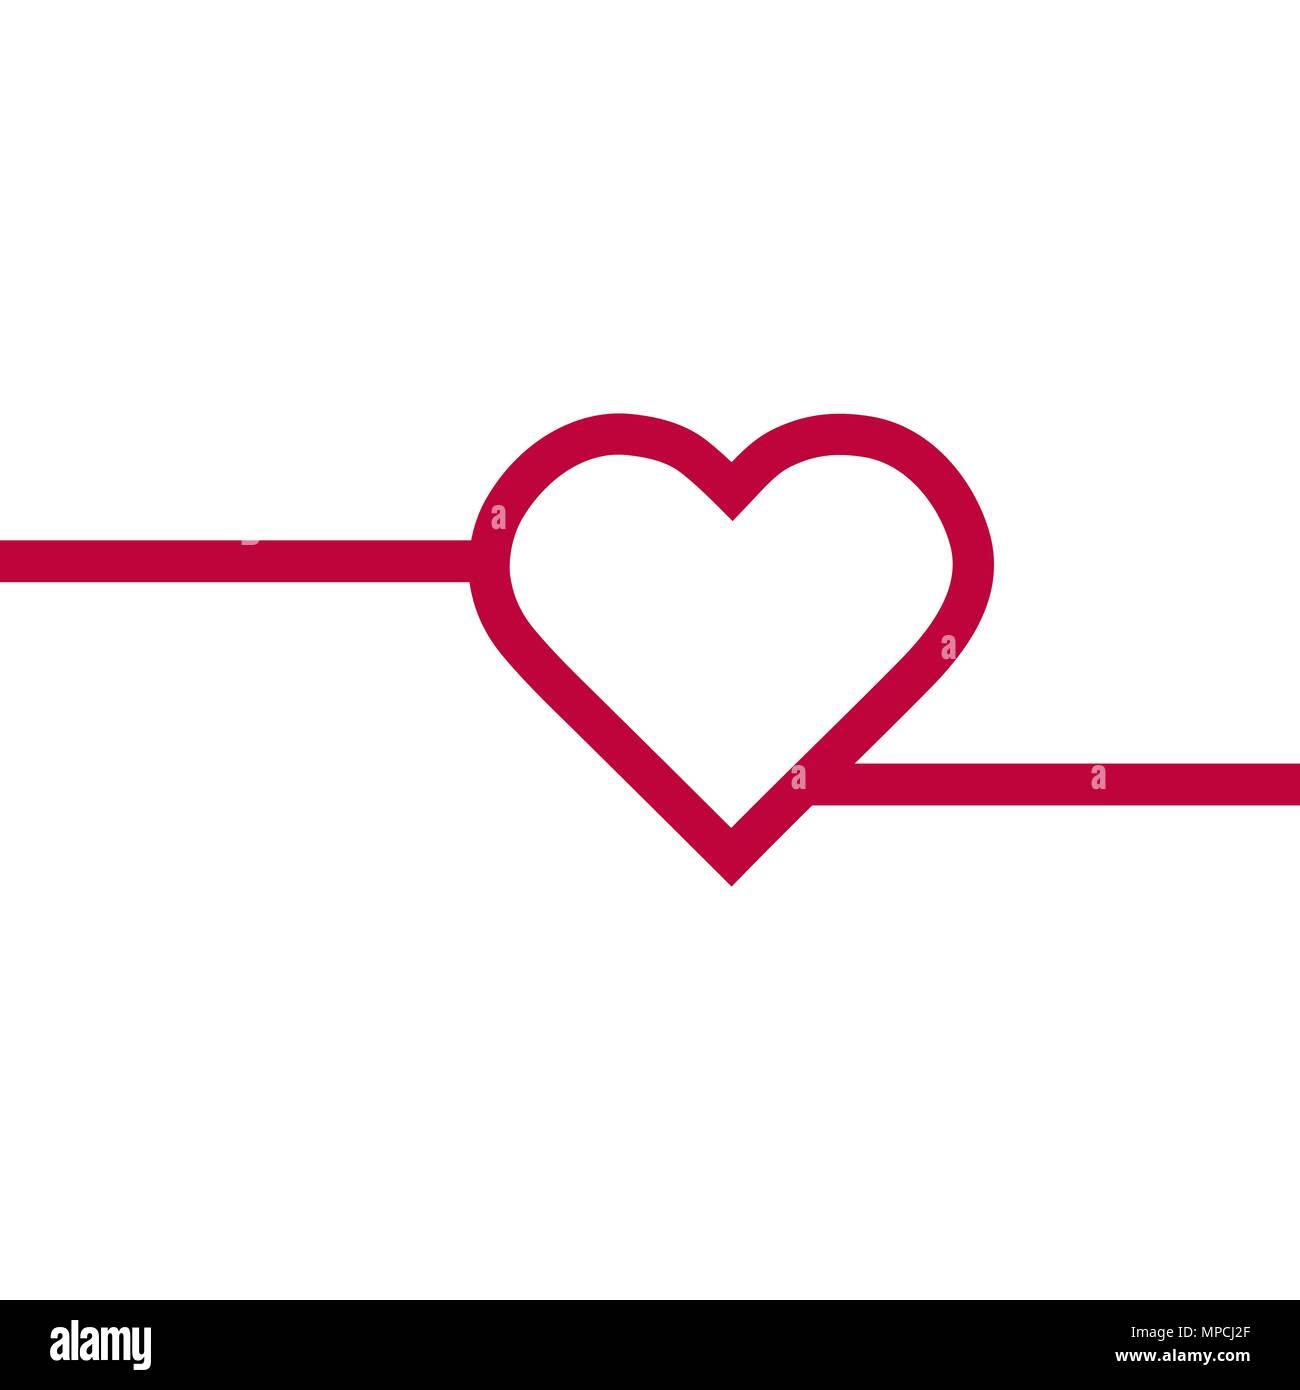 Heart Arrow Love Symbol Outline Stock Vector Images Alamy